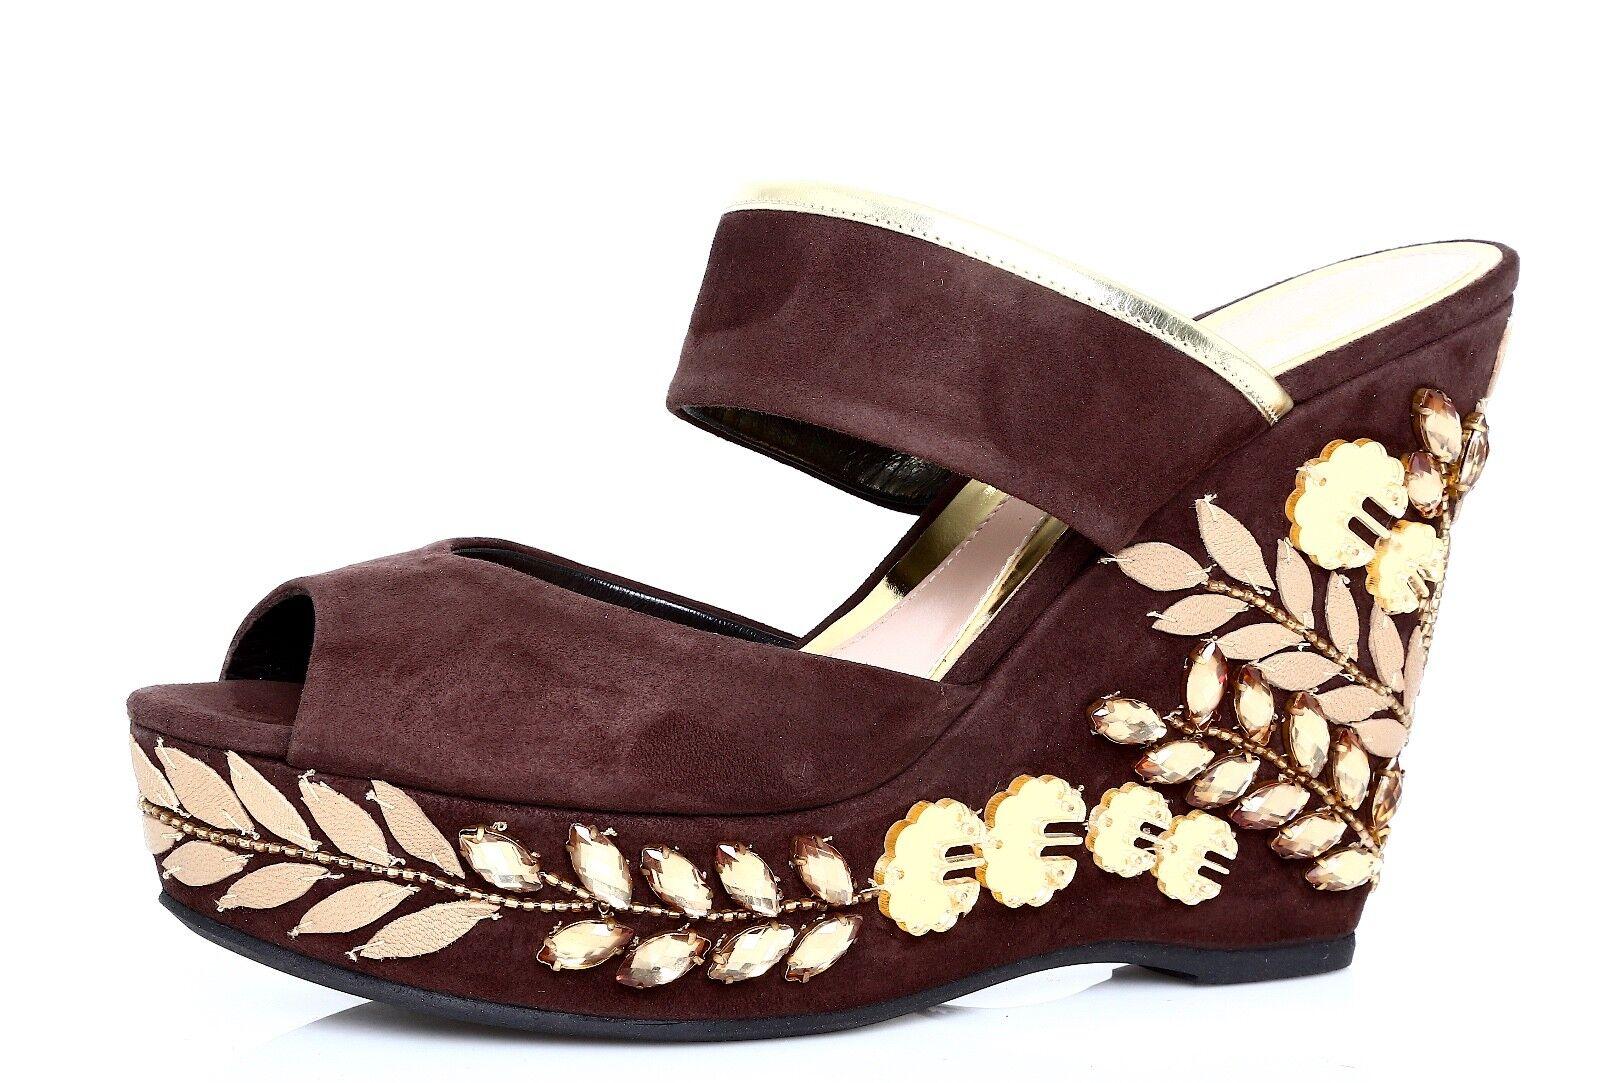 Sebastian Milano Milano Milano comascio Slip On Sandalia De Cuña Gamuza Marrón Mujeres Talla 38 4189  mejor moda